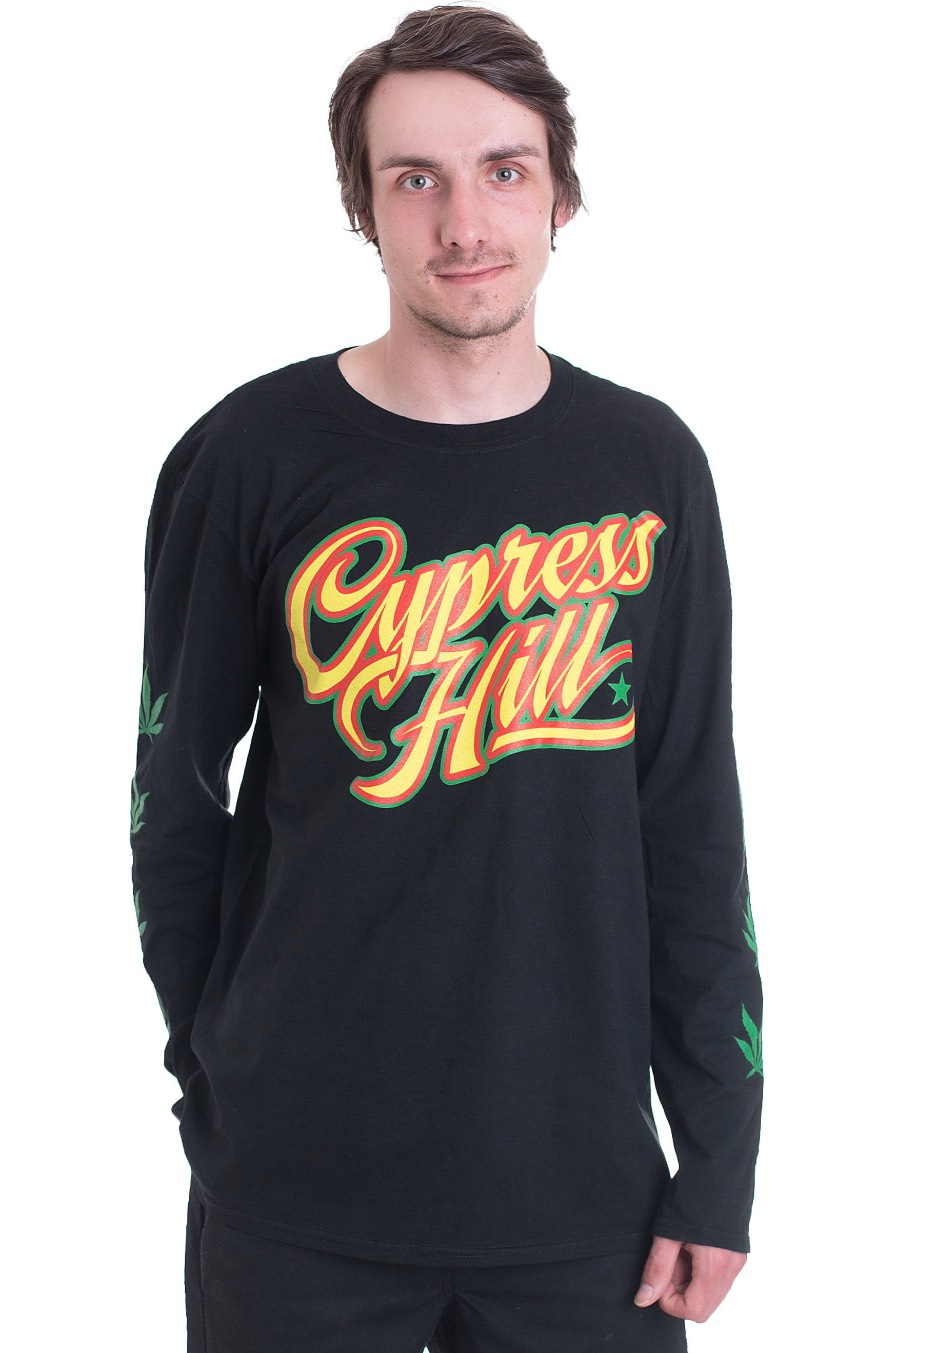 Cypress Hill Rasta NEW MENS LONG SLEEVE SHIRT